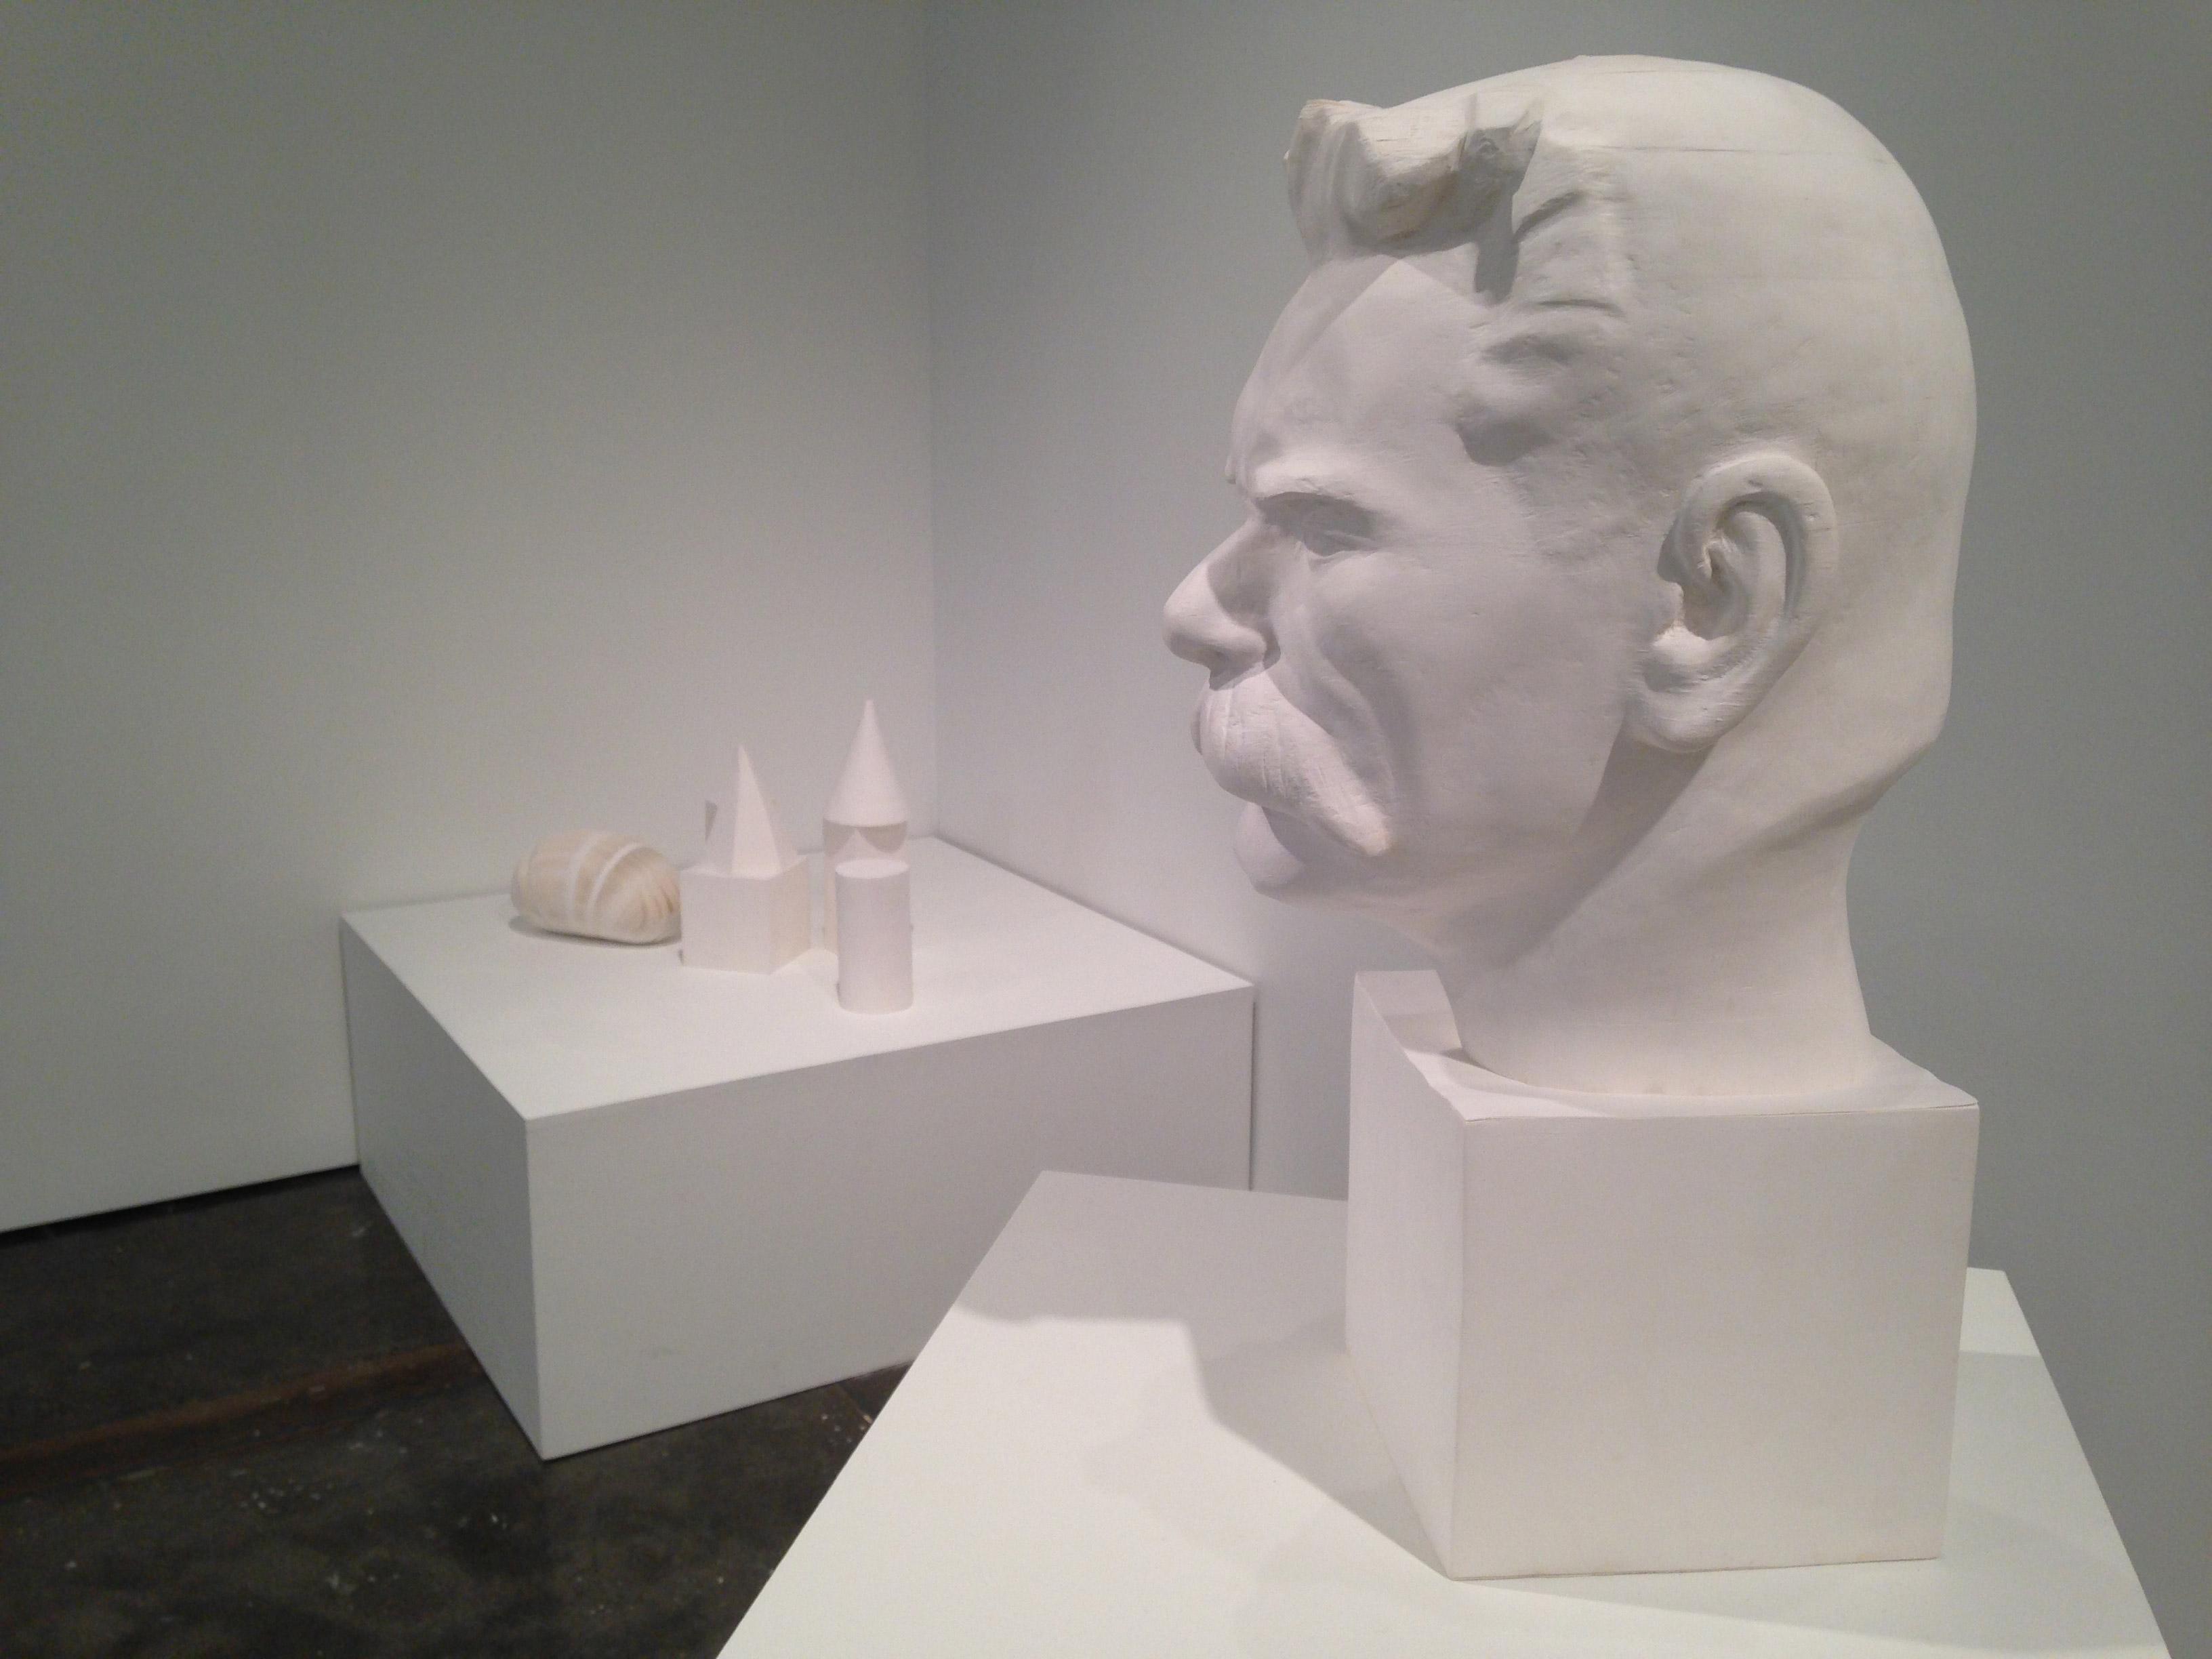 paper-sculptures-li-hongbo-18